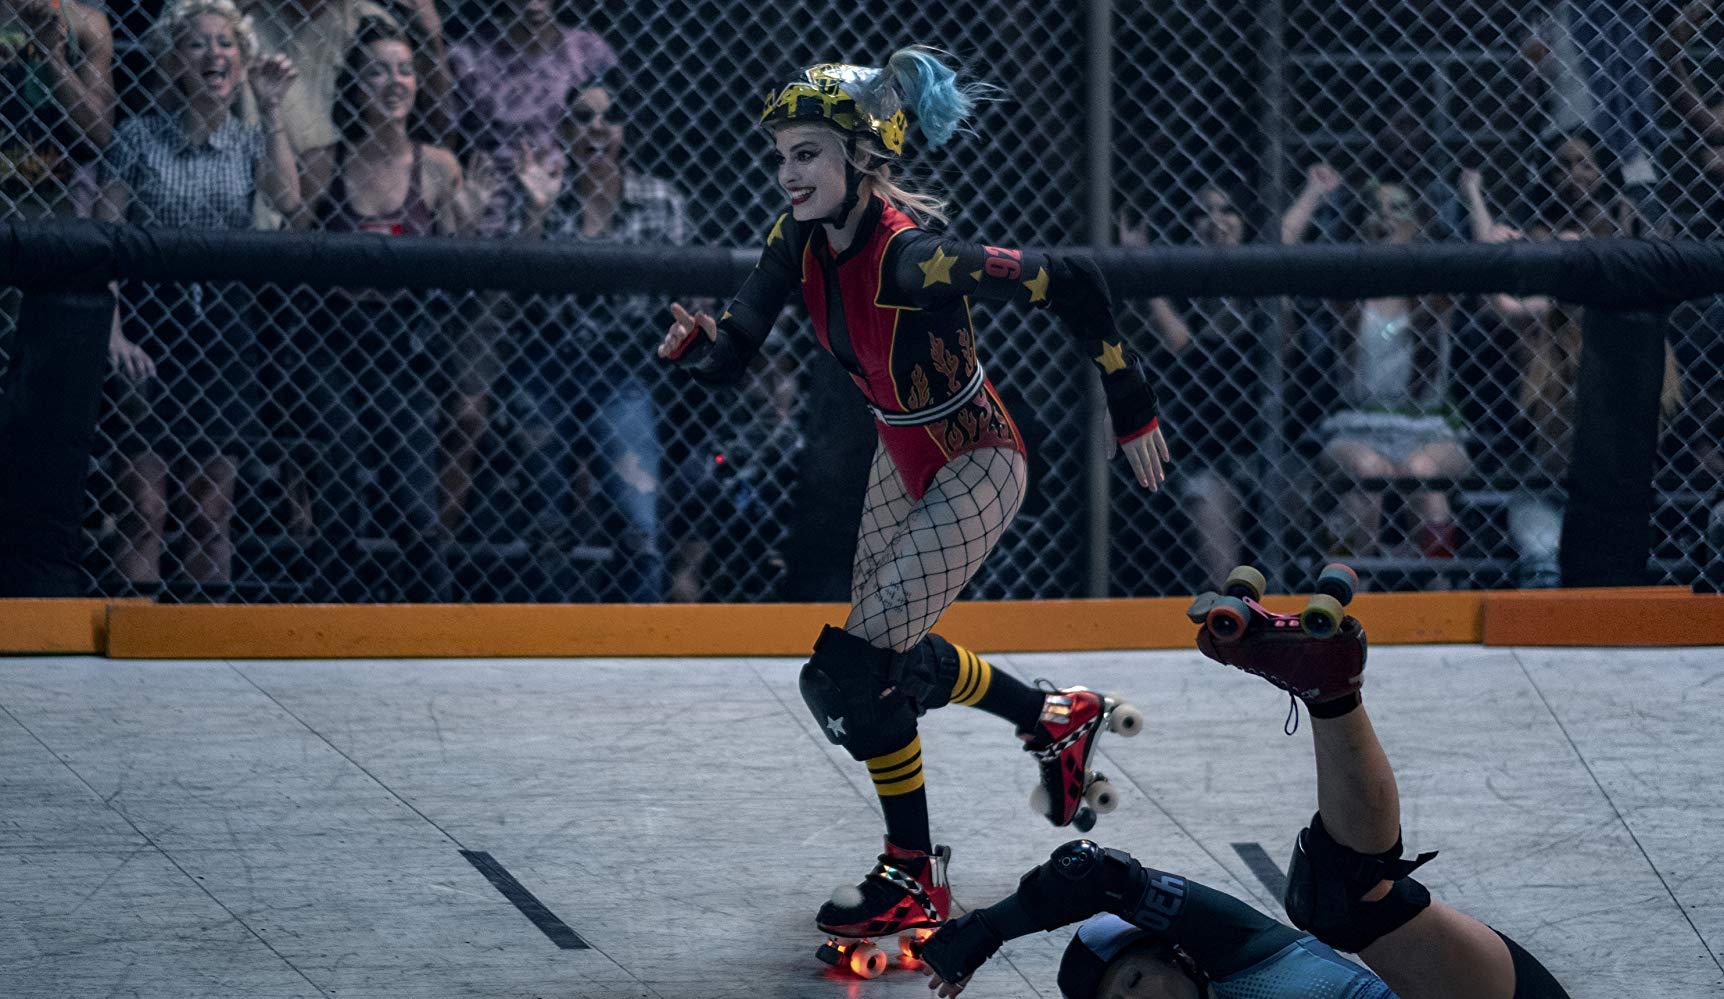 Birds Of Prey - E la fantasmagorica rinascita di Harley Quinn: Margot Robbie in una scena del film